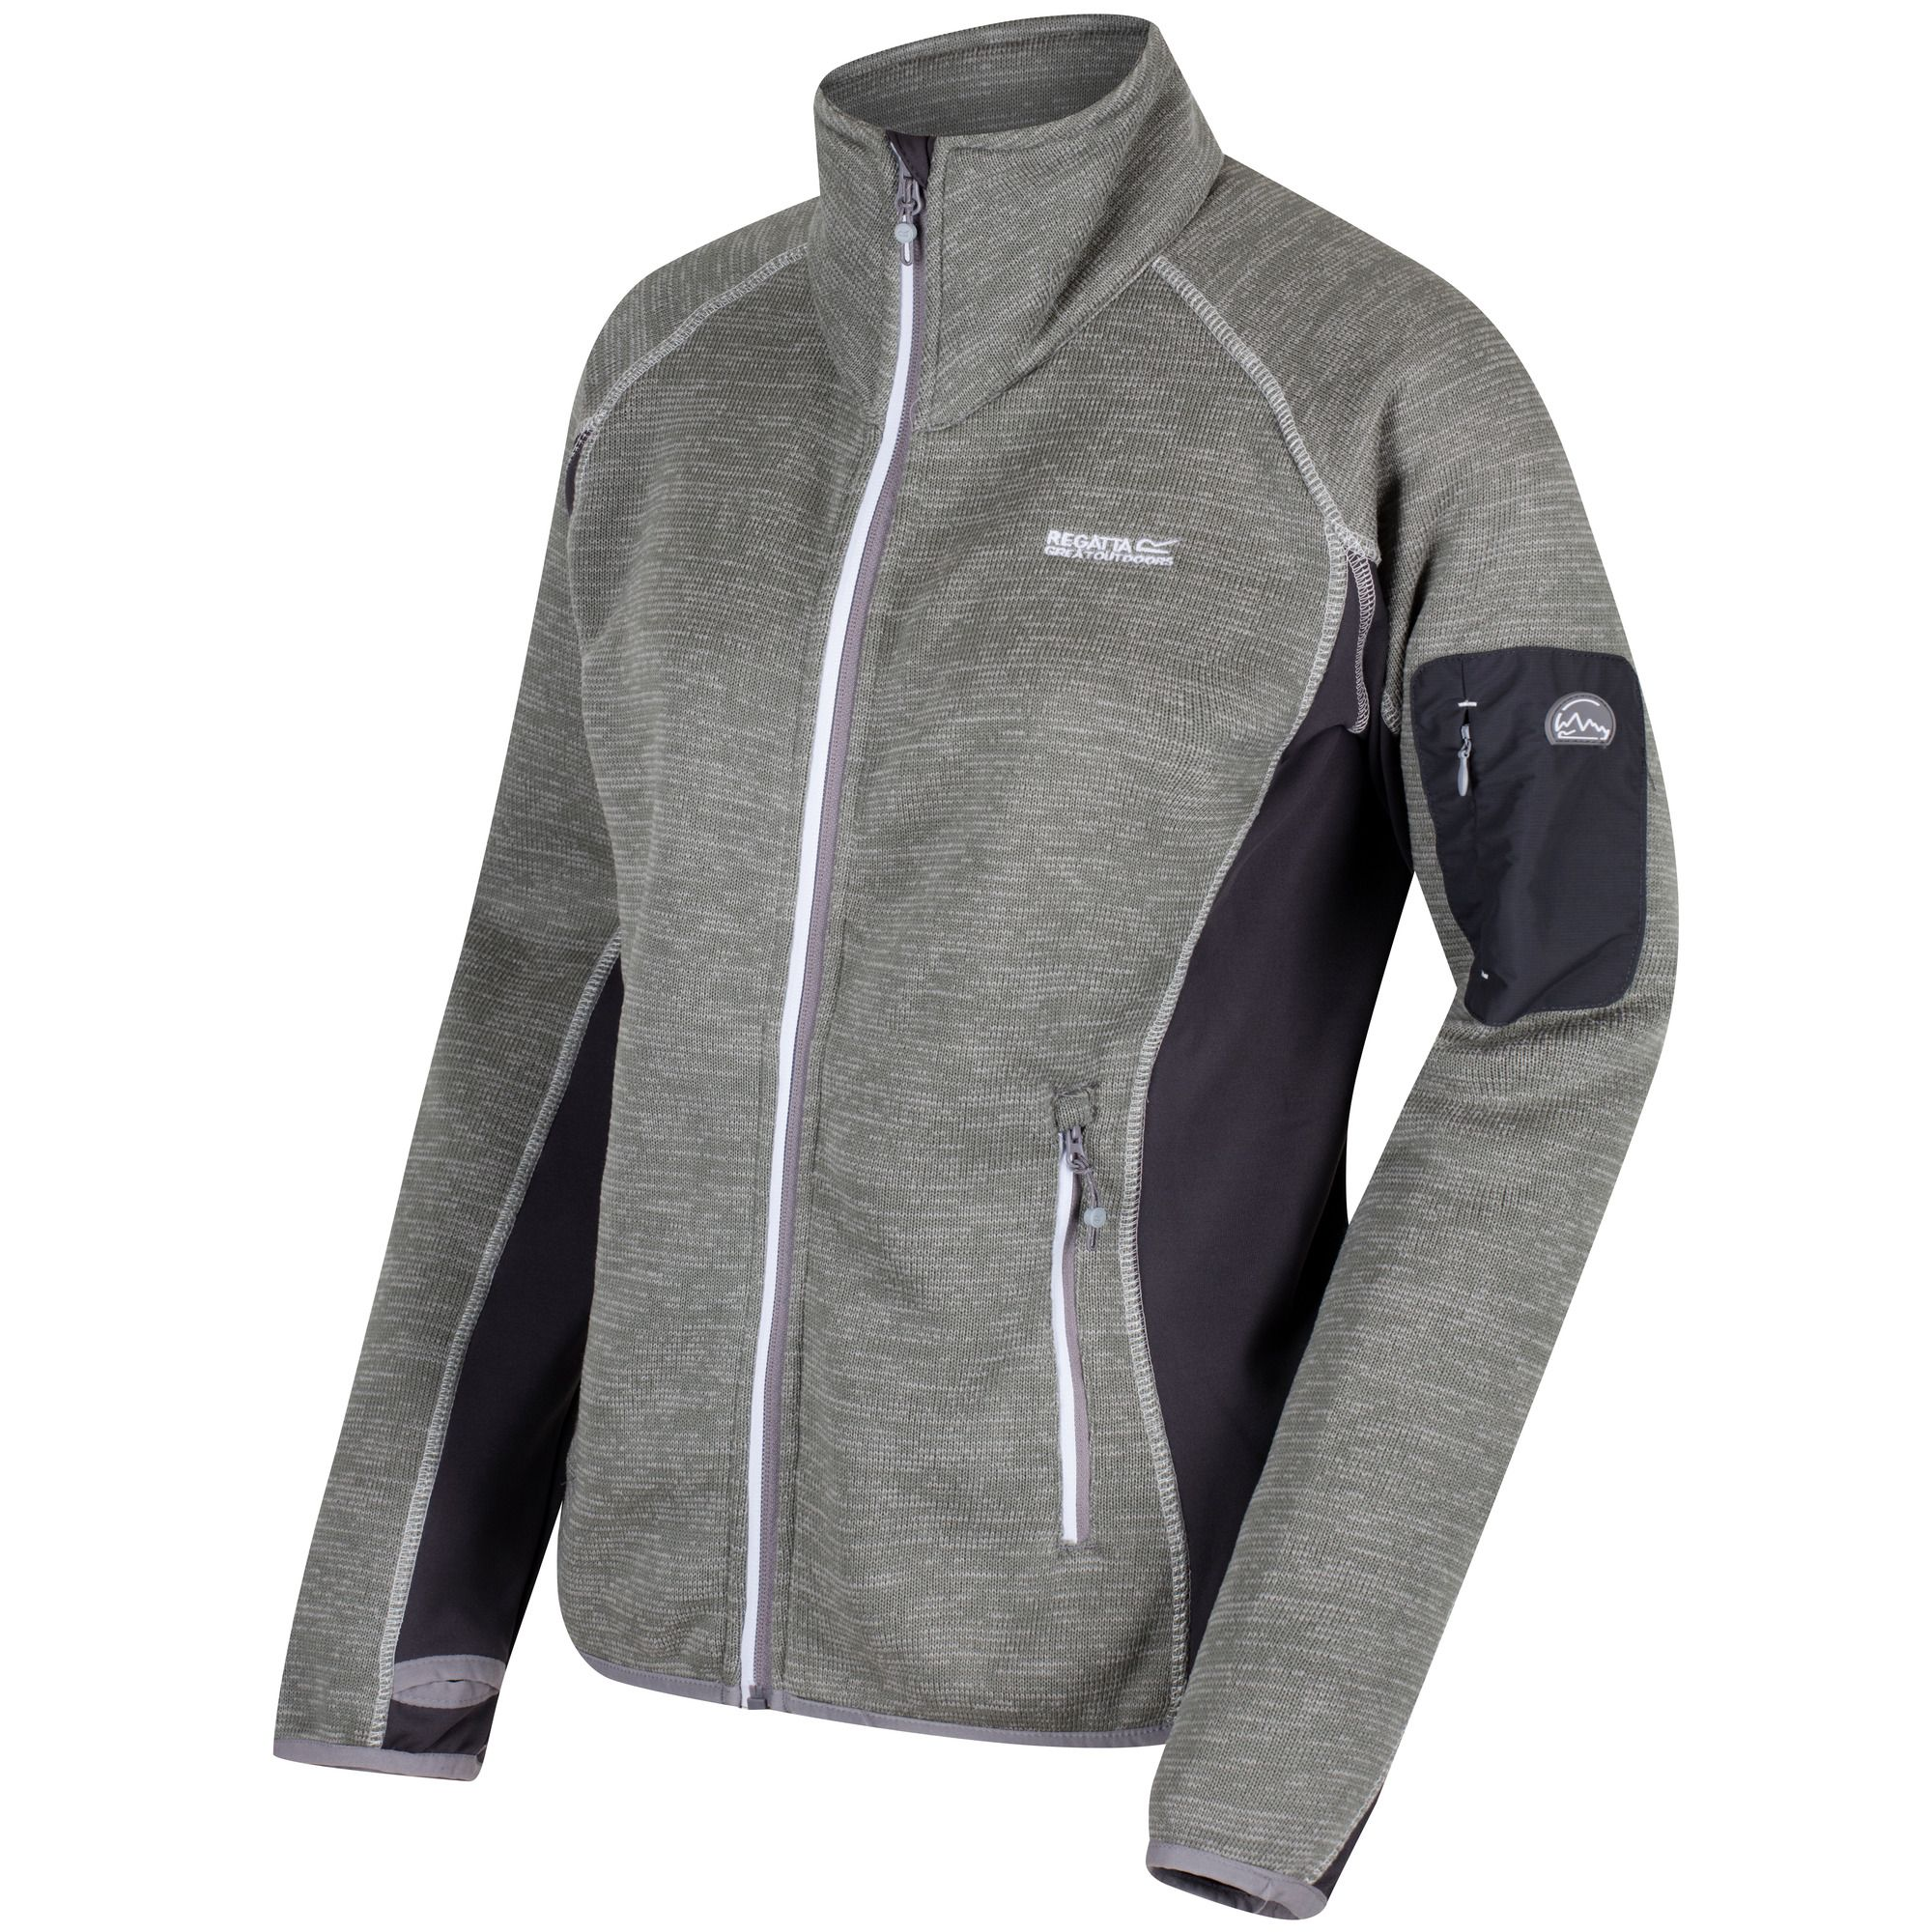 Regatta Great Outdoors Womens/Ladies Laney III Fleece Jacket (Rock Grey/Seal Grey)